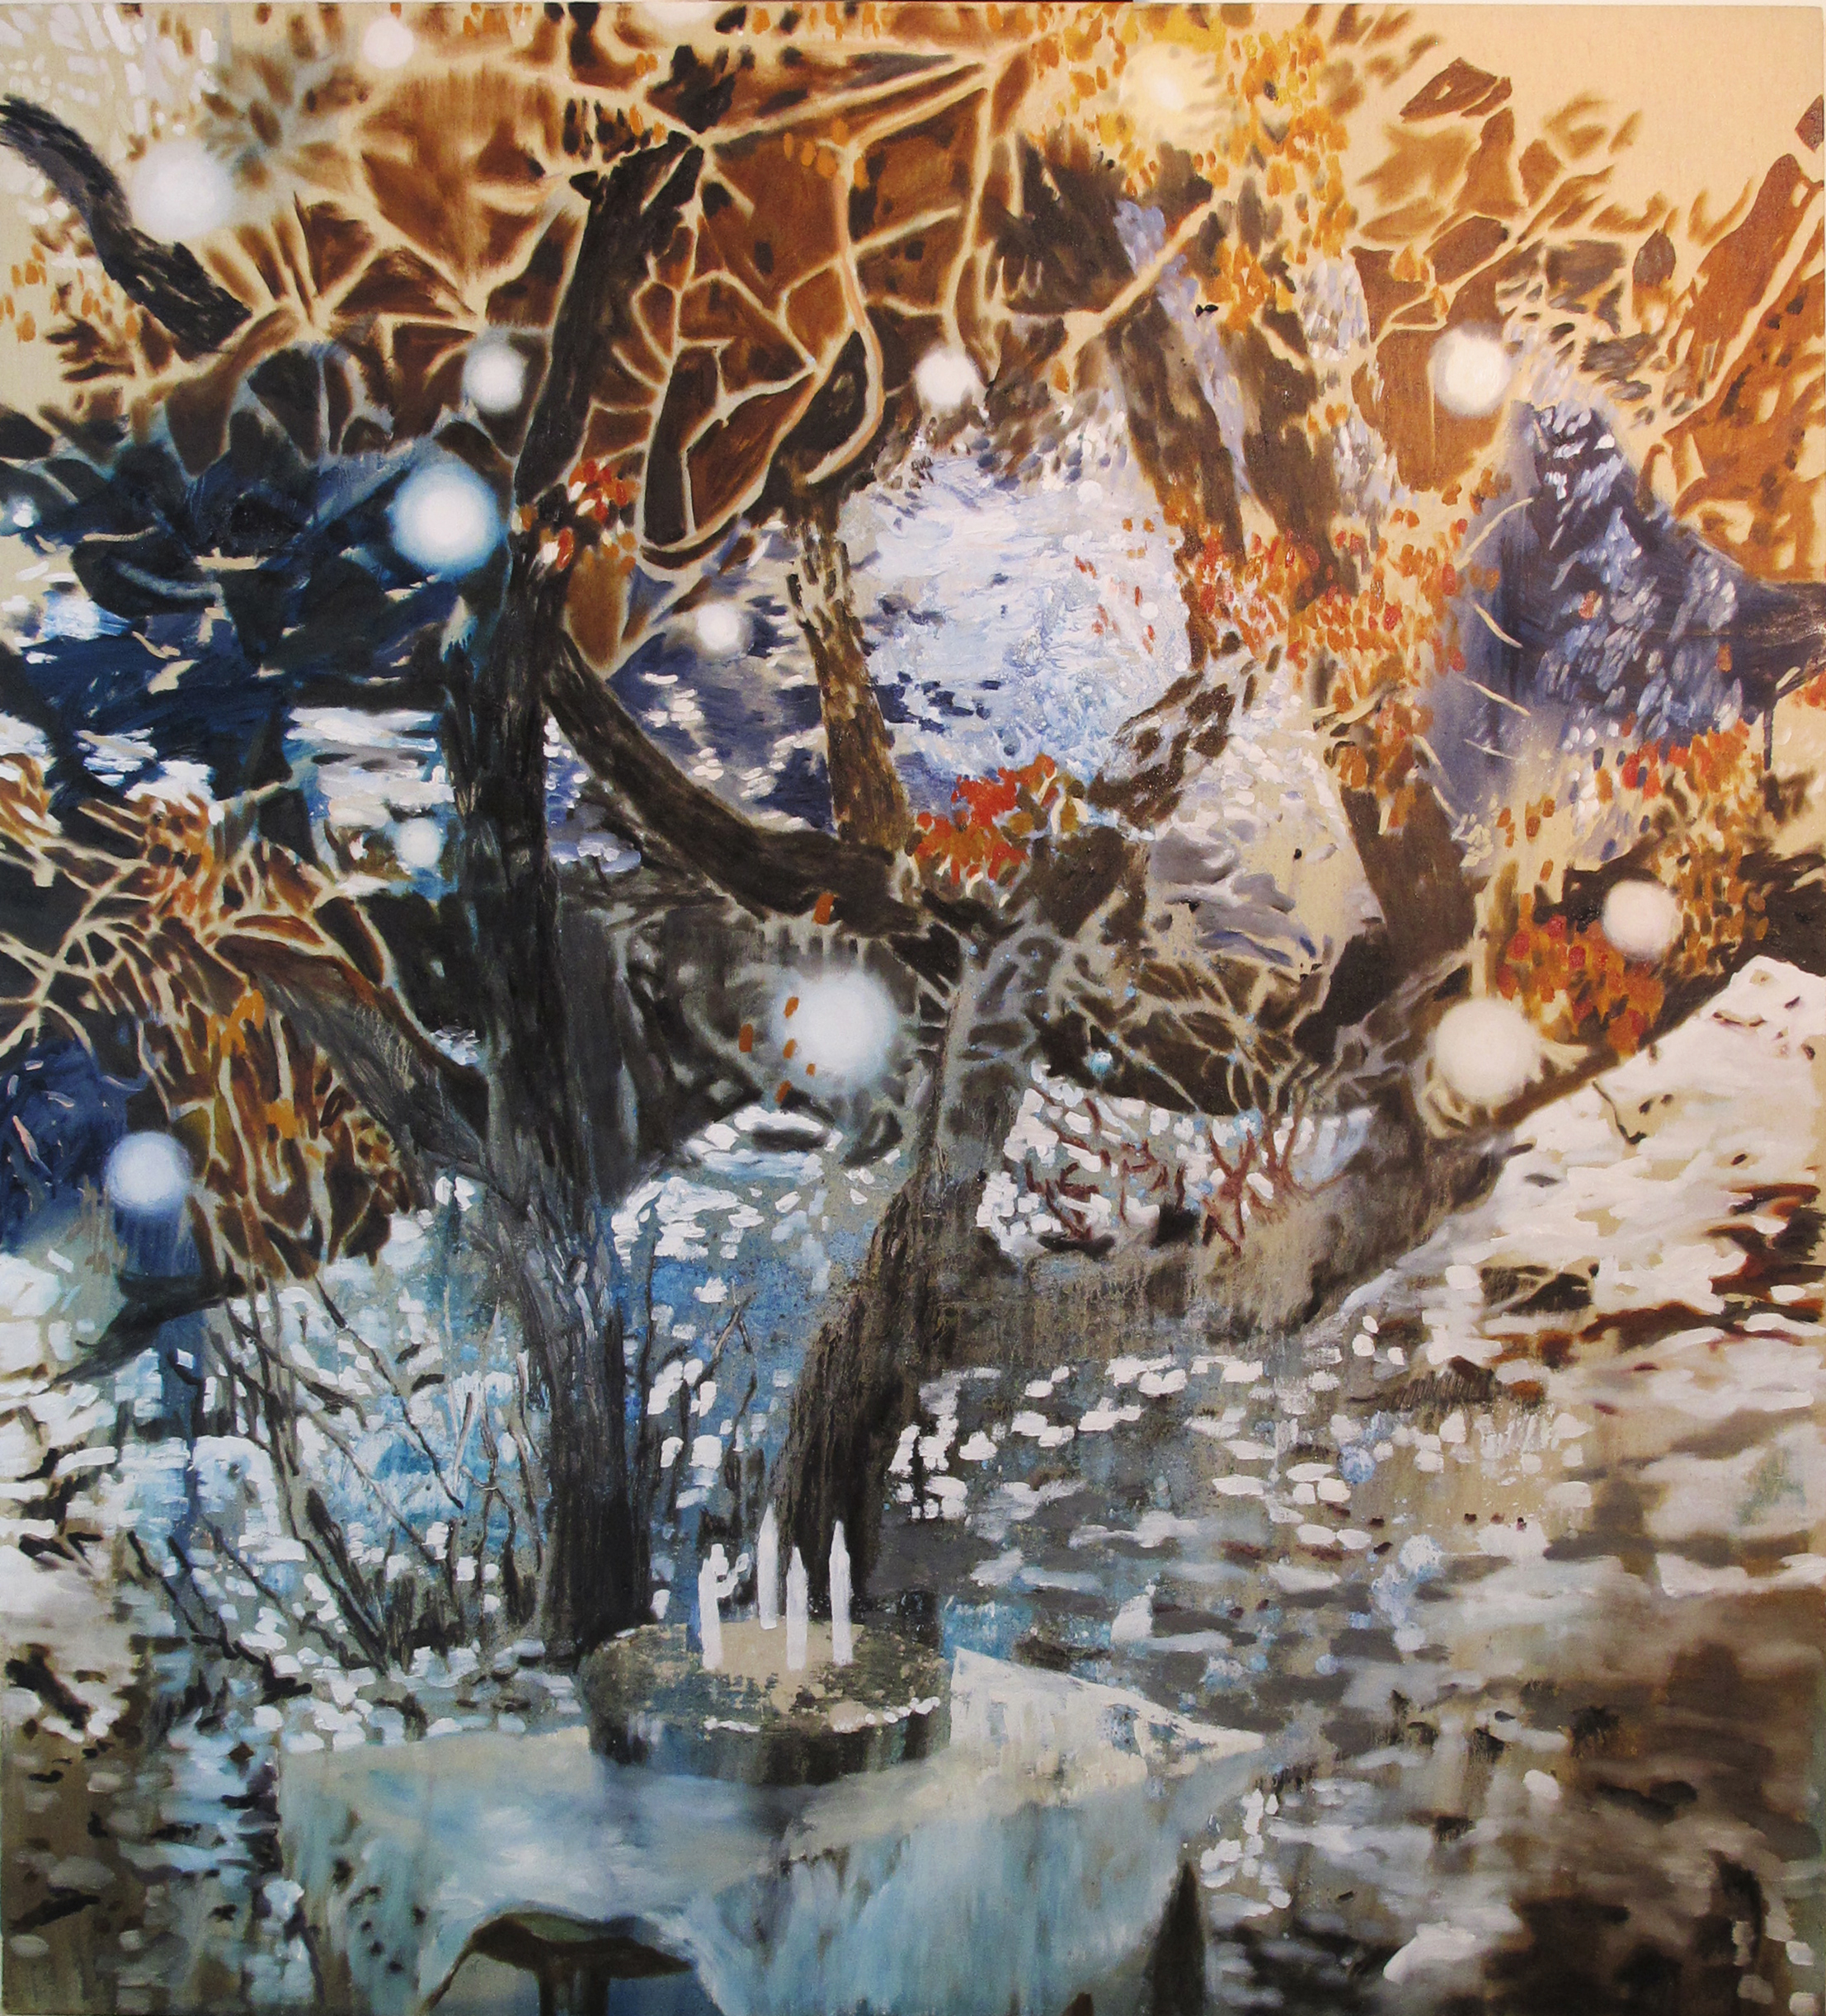 1. Zanbagh Lotfi, Memory Vague, 2015. Tecnica mista e olio su tela, 150 x 135 cm.